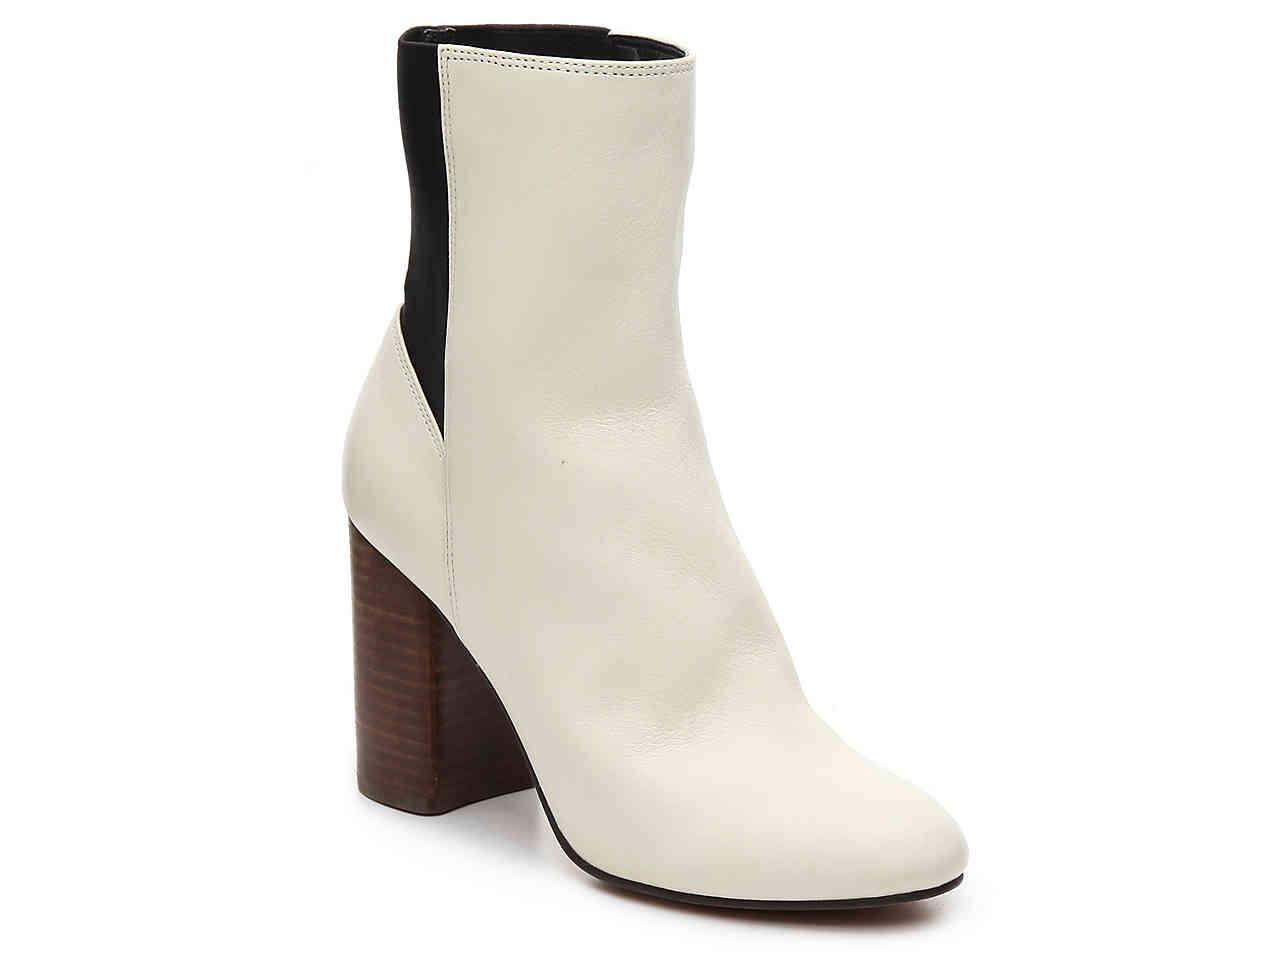 Dolce Vita Ramona Bootie - Women's - Off White